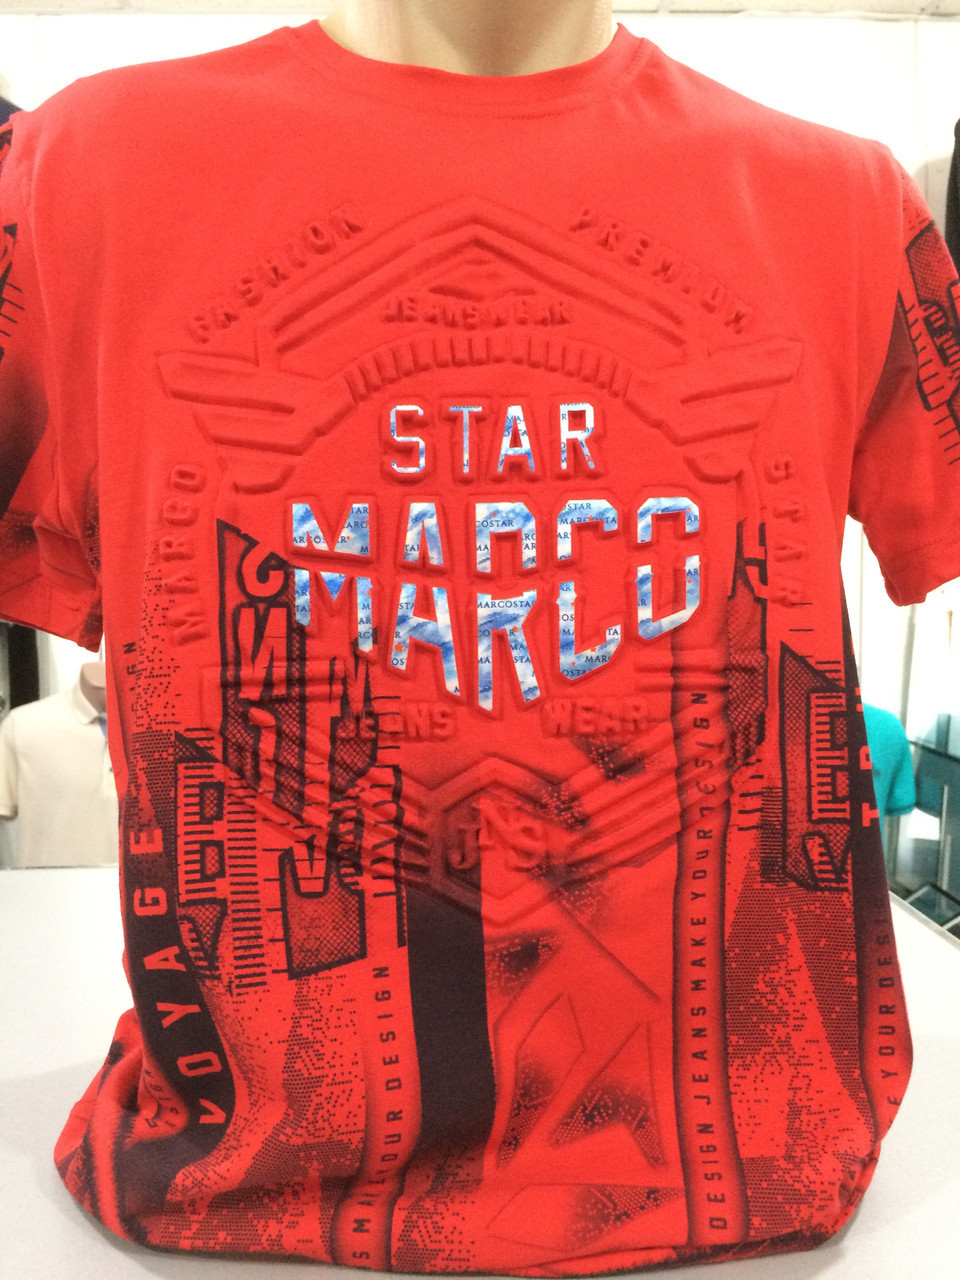 Стильна молодіжна чоловіча футболка.Червона.Туреччина.Hedricy Розмір - L(50) d64489e4e6f90